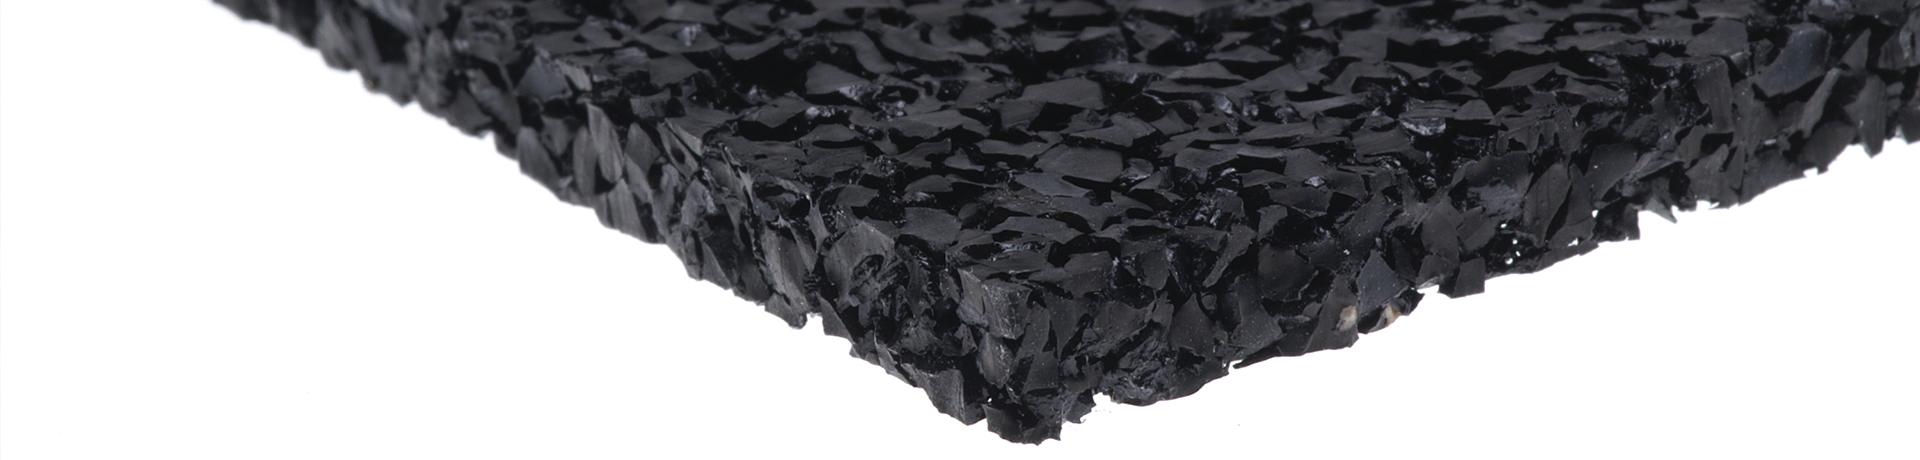 Printen op rubber